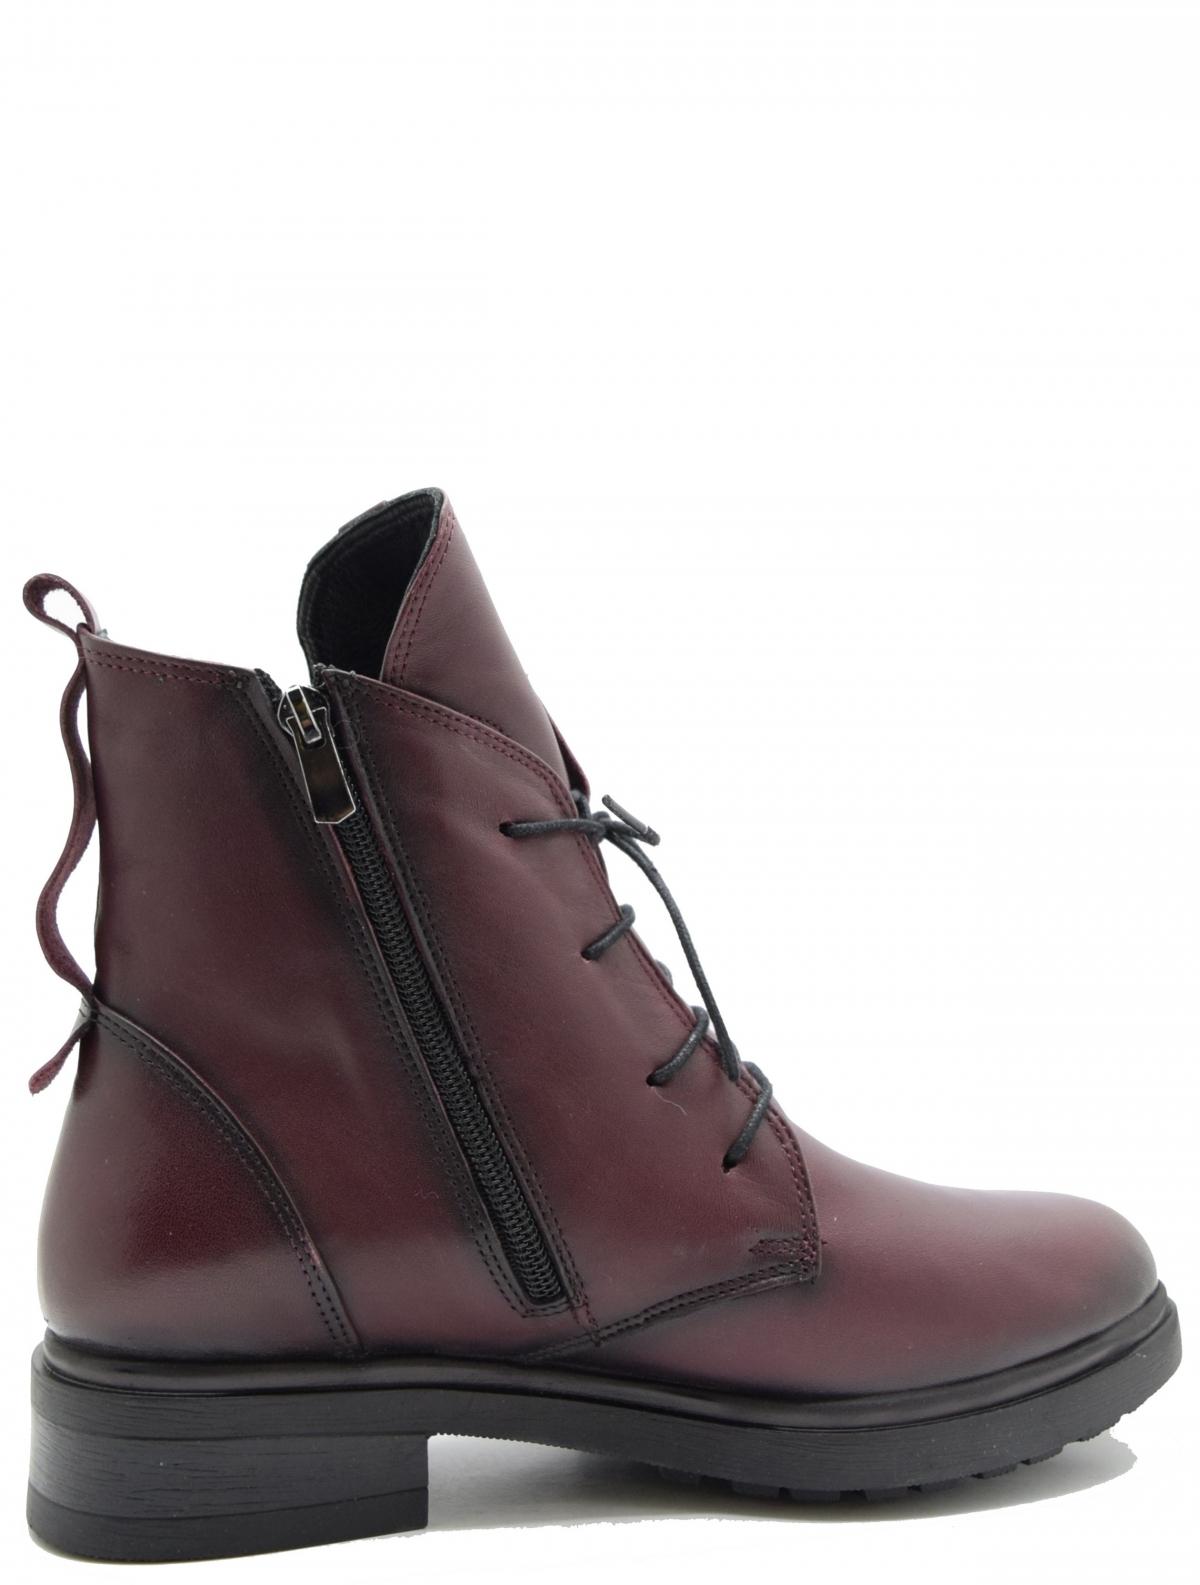 SM 657-153-12-90 женские ботинки